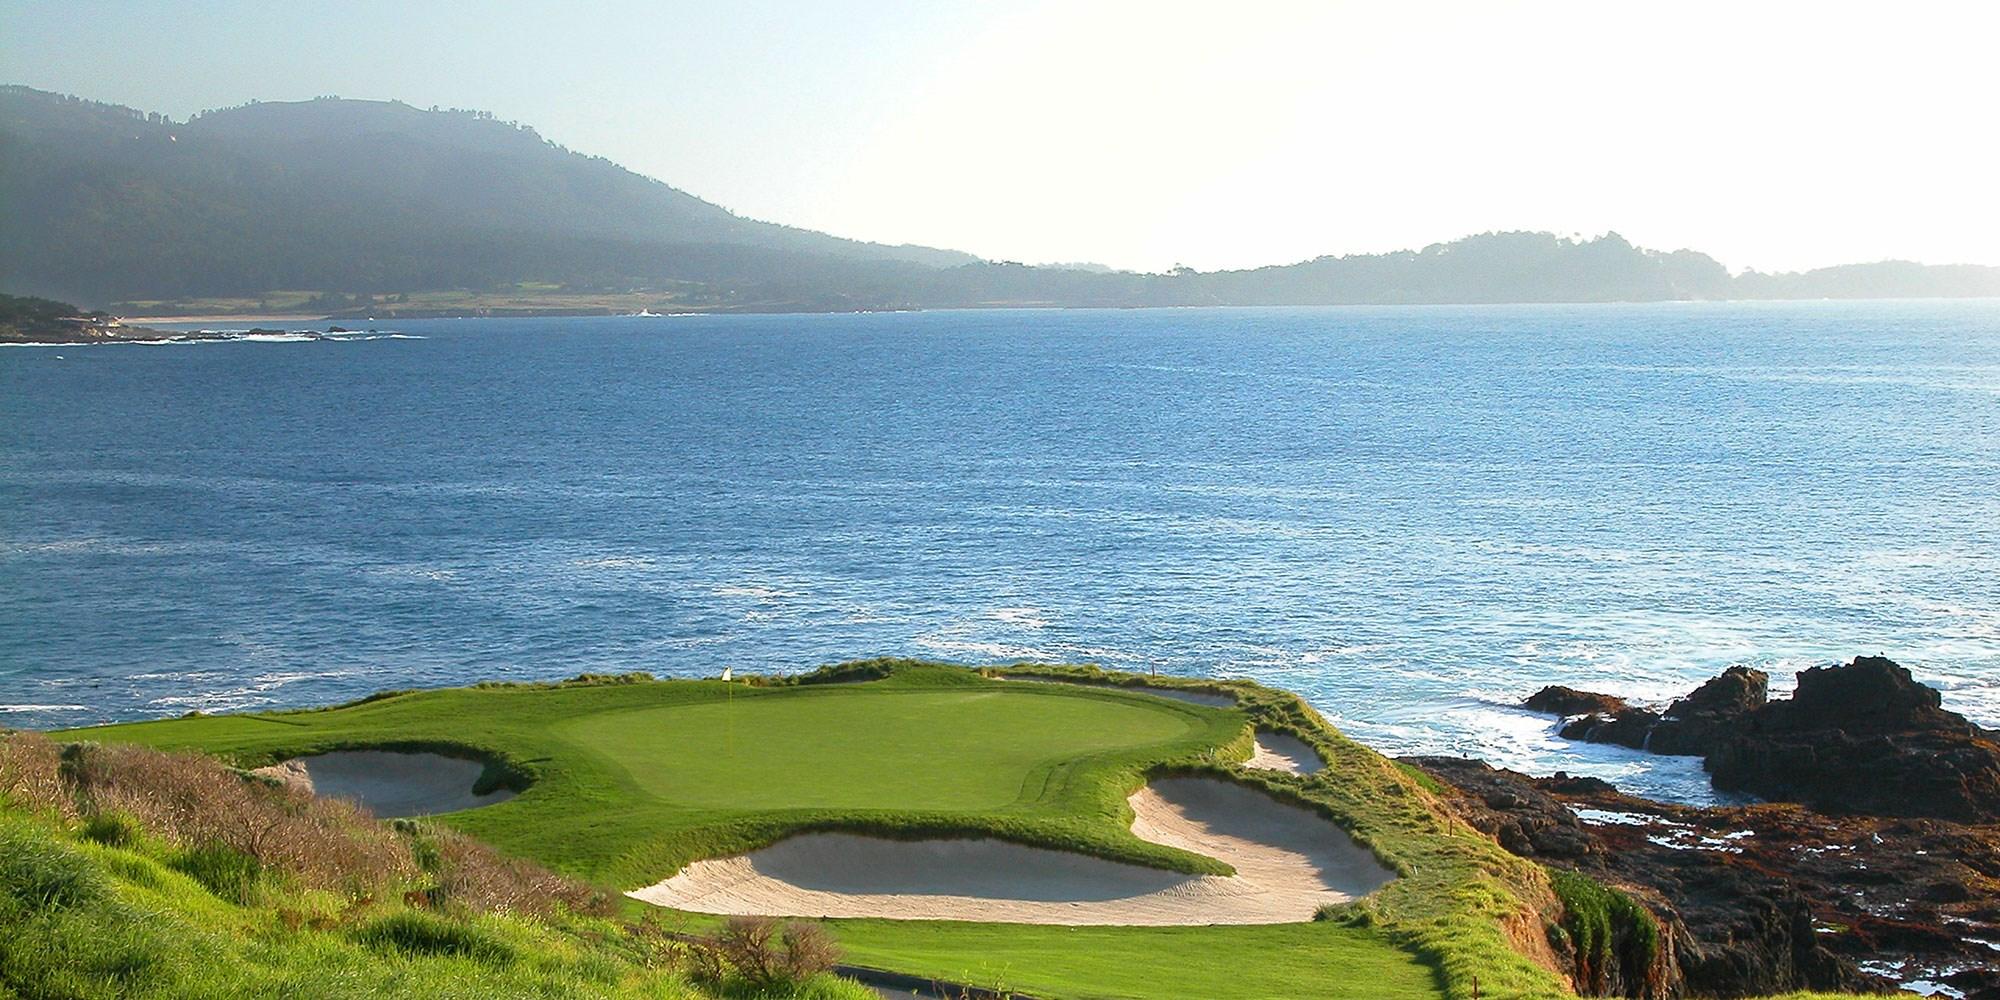 USA - Pebble Beach Trip (Monterey Peninsula) | 8 nights, 5 games